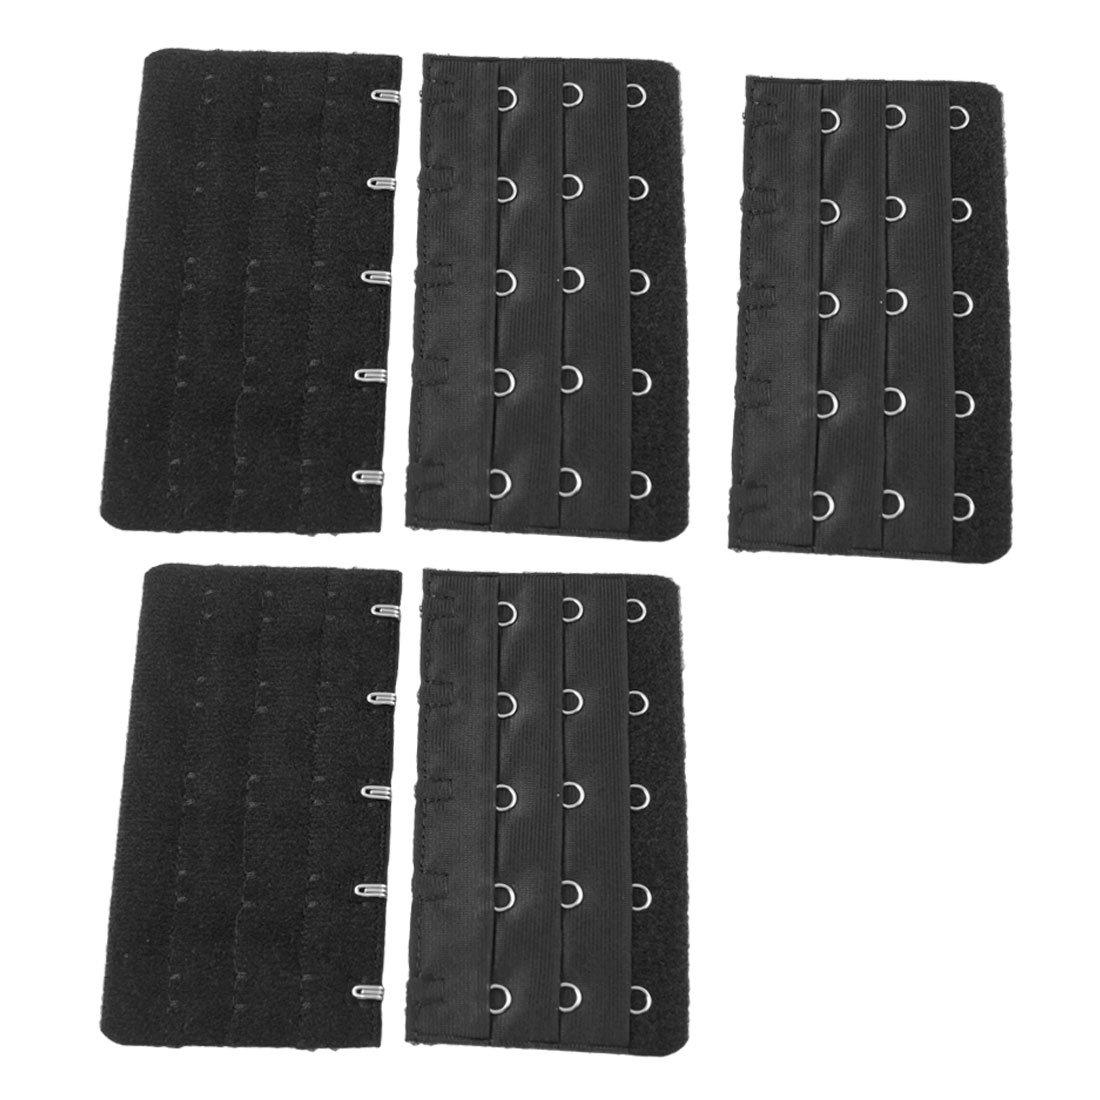 KSFS Black 5 Rows Hook and Eye Tape Extension Bra Strap Extender 5 Pcs for Women